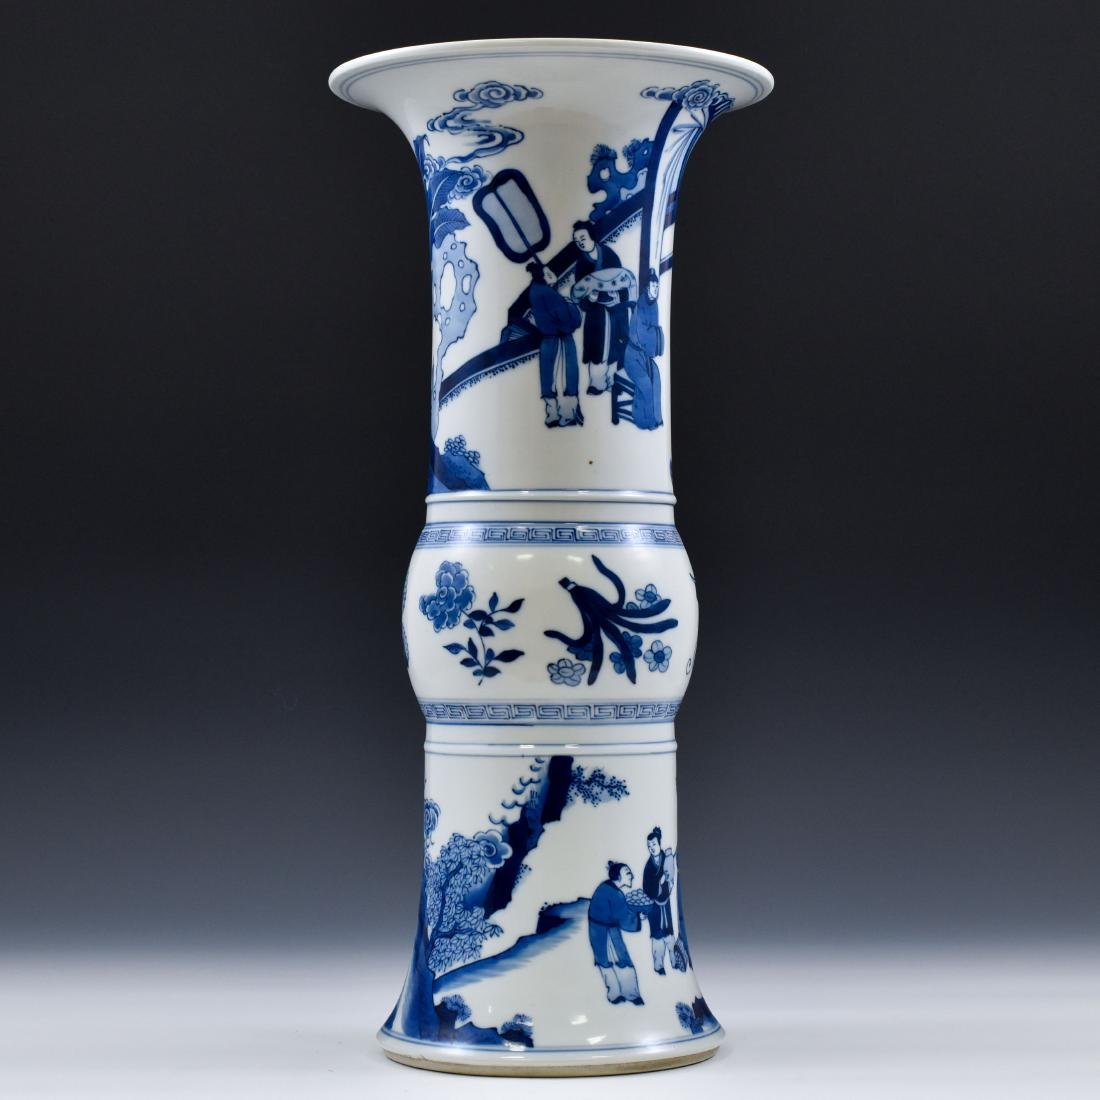 FINE CHINESE BLUE & WHITE PORCELAIN GU VASE